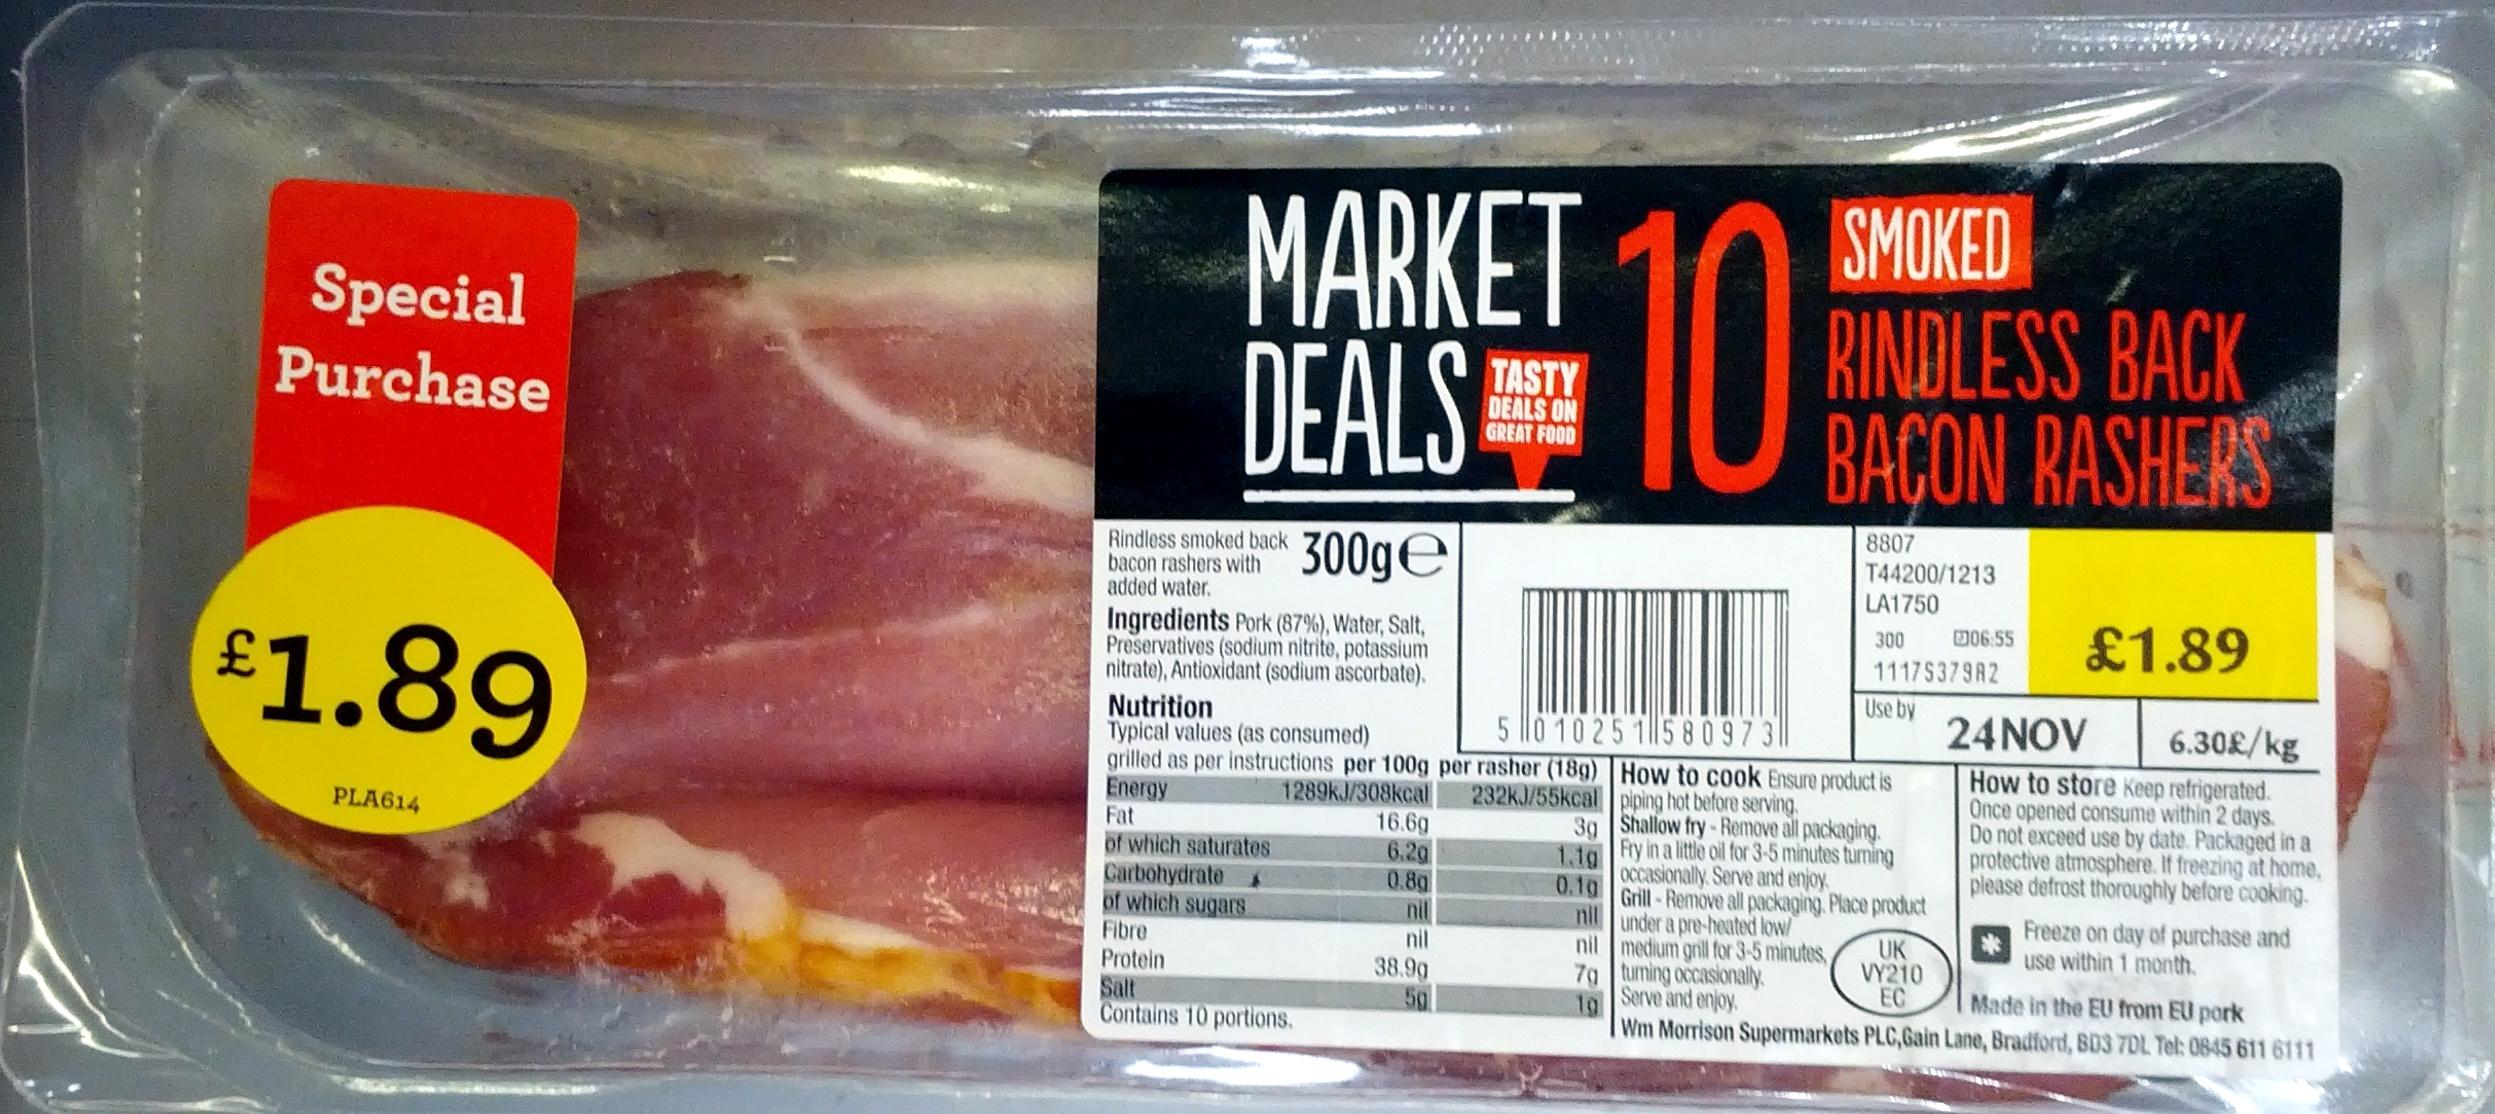 Smoked Rindless Back Bacon Rashers - Product - en